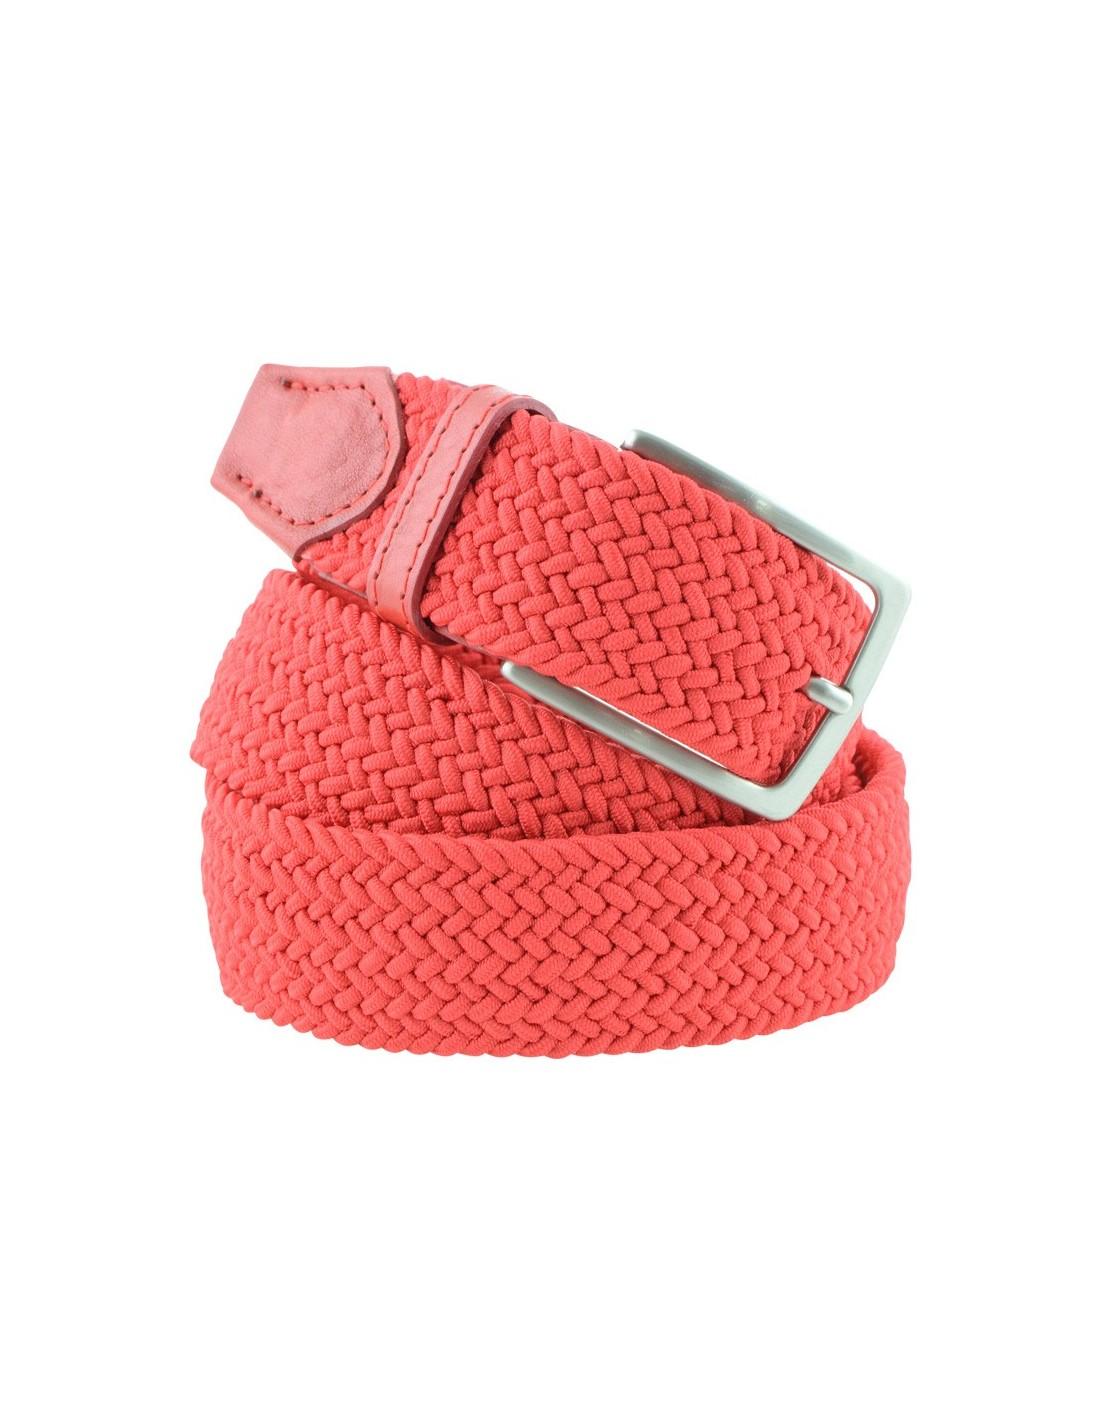 l'ultimo 169a7 72bab Cintura elastica uomo intrecciata rossa